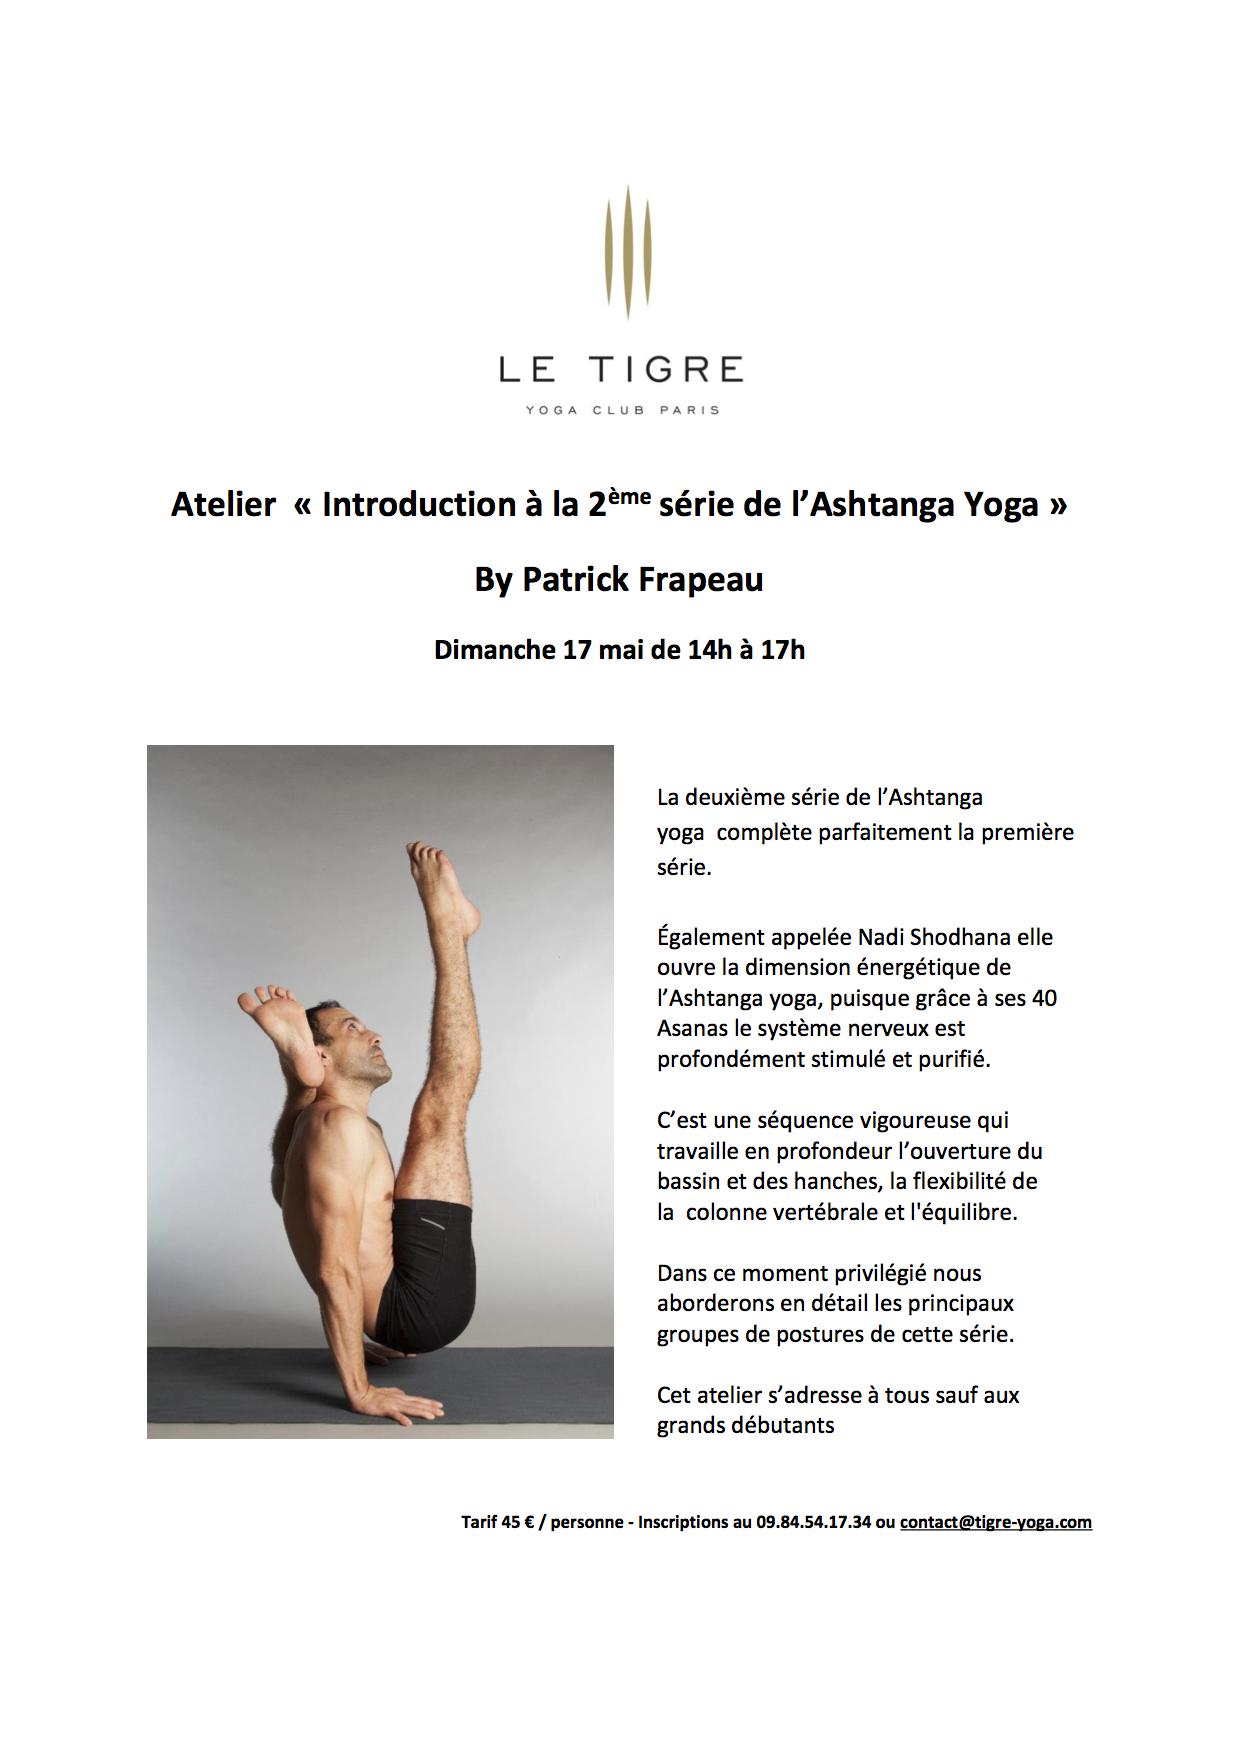 ashtanga yoga patrick frapeau